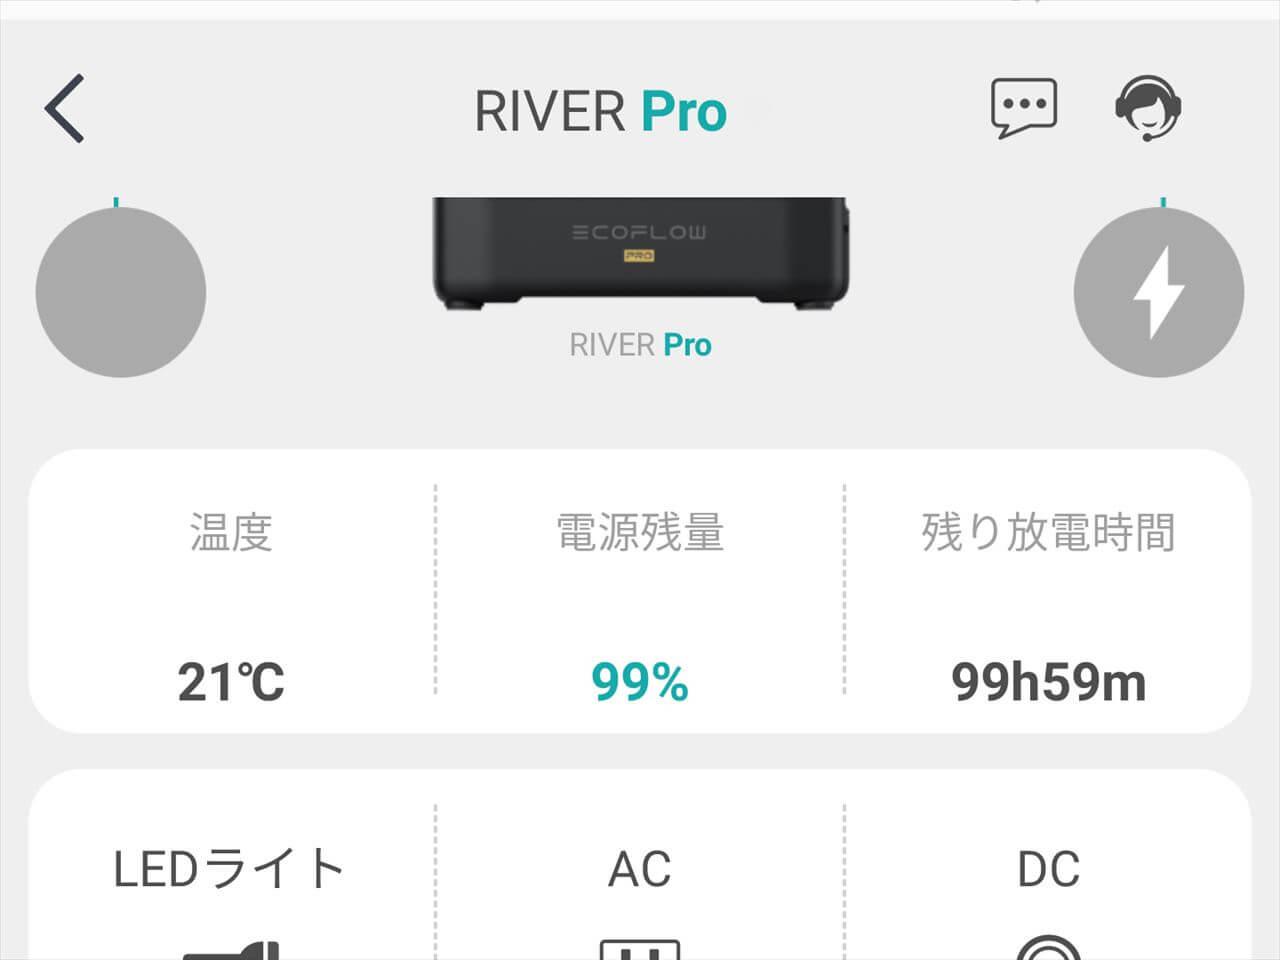 EcoFlow RIVER Pro ポータブル電源をEcoFlowアプリでスマートフォンに接続 アプリ画面